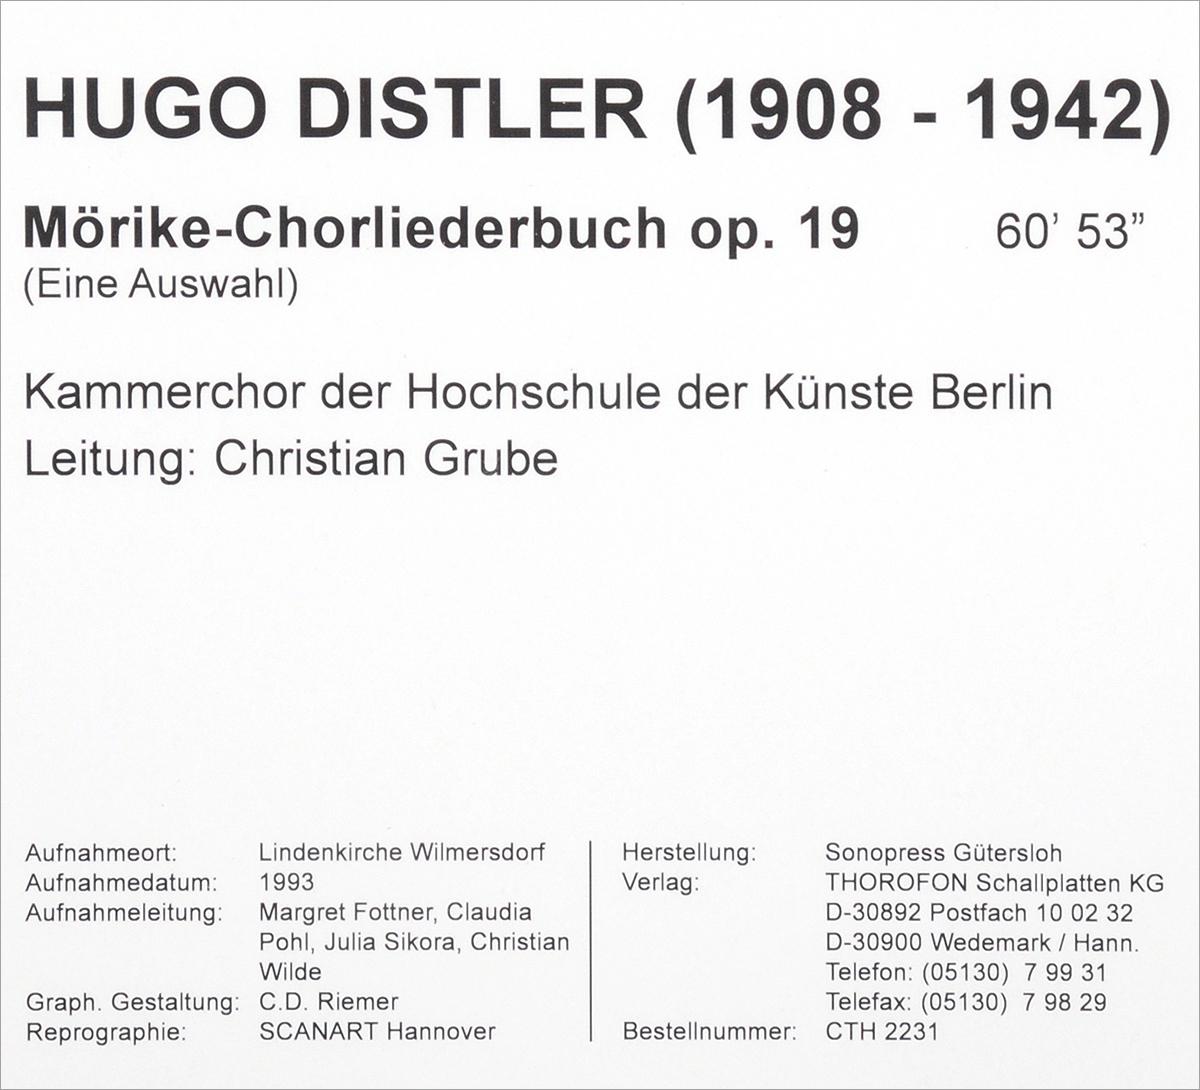 Hugo Distler. Morike-Chorliederbuch. Хуго Дистлер